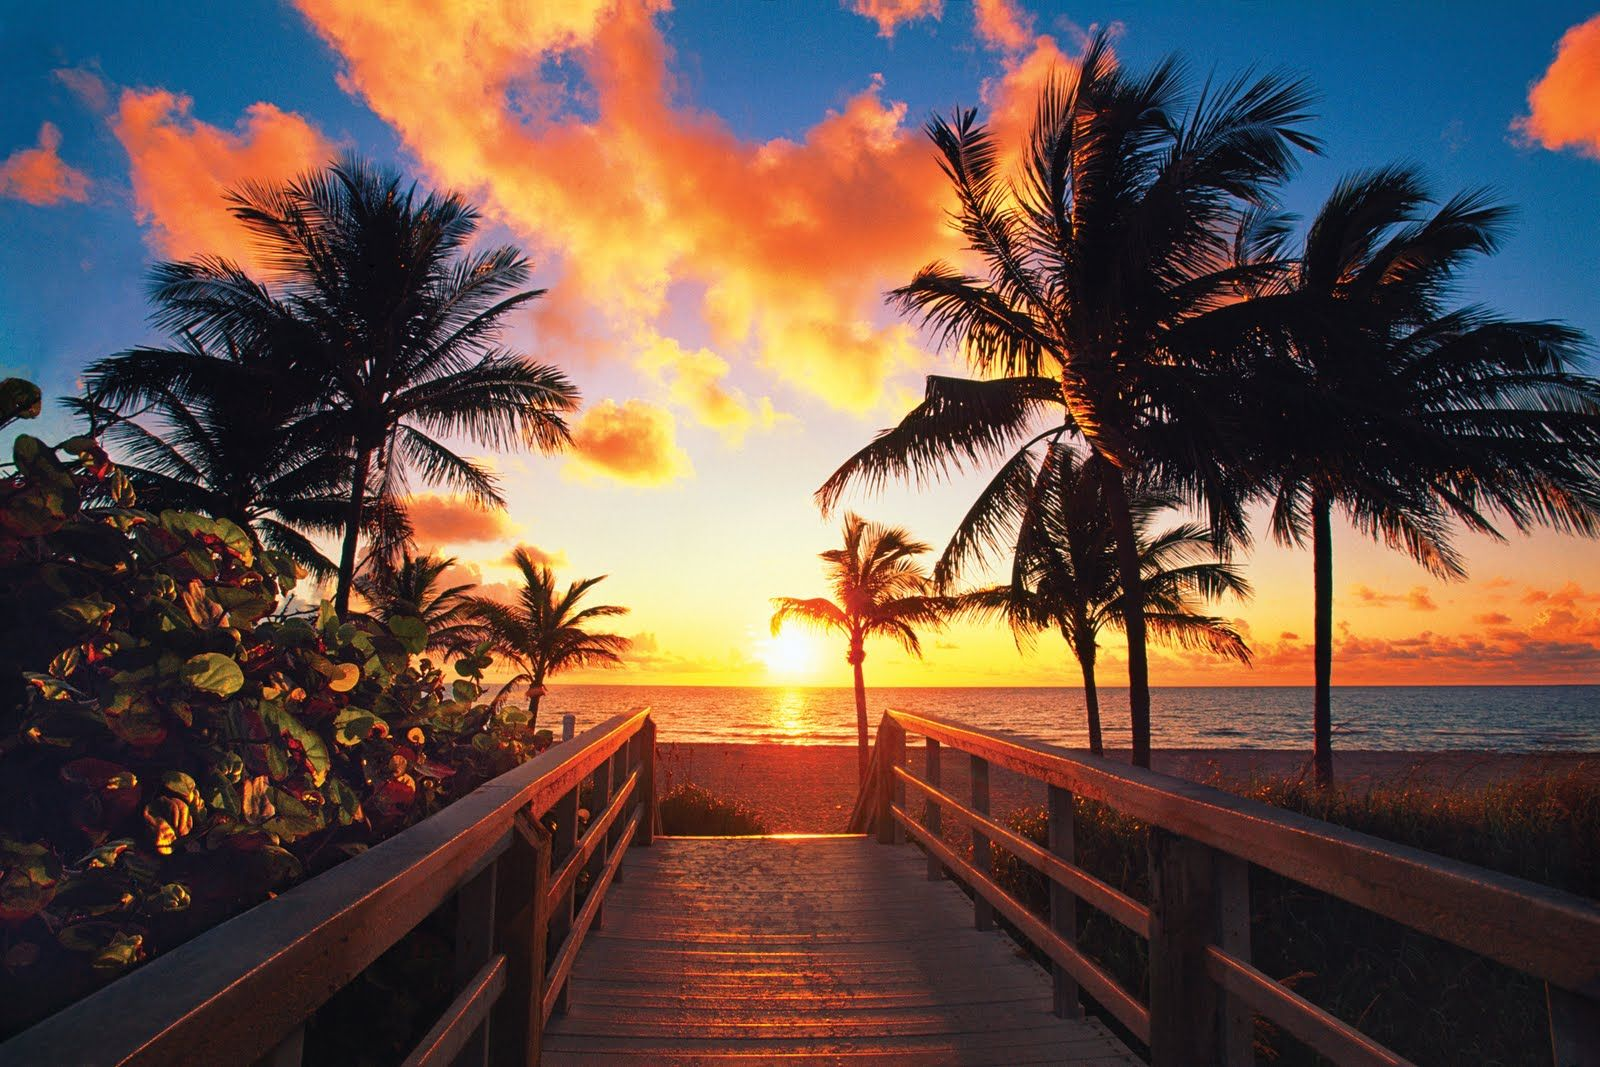 Tropical Sunrise Wallpaper Vorrei essere qui Hollywood beach 1600x1067